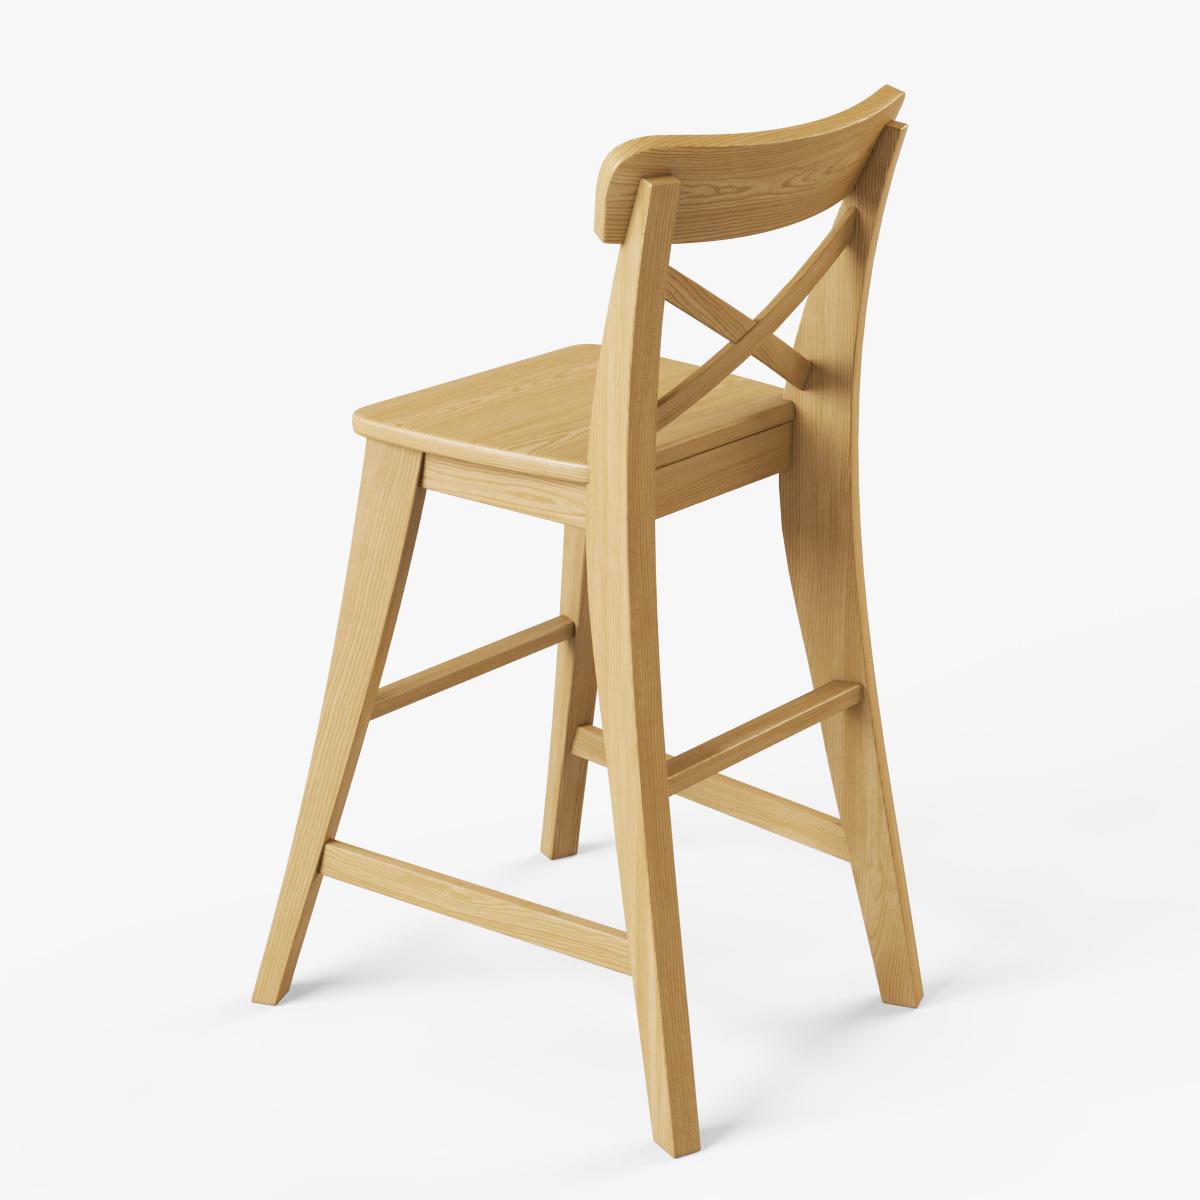 ikea junior chair mid century rocking ingolf by markelos 3docean